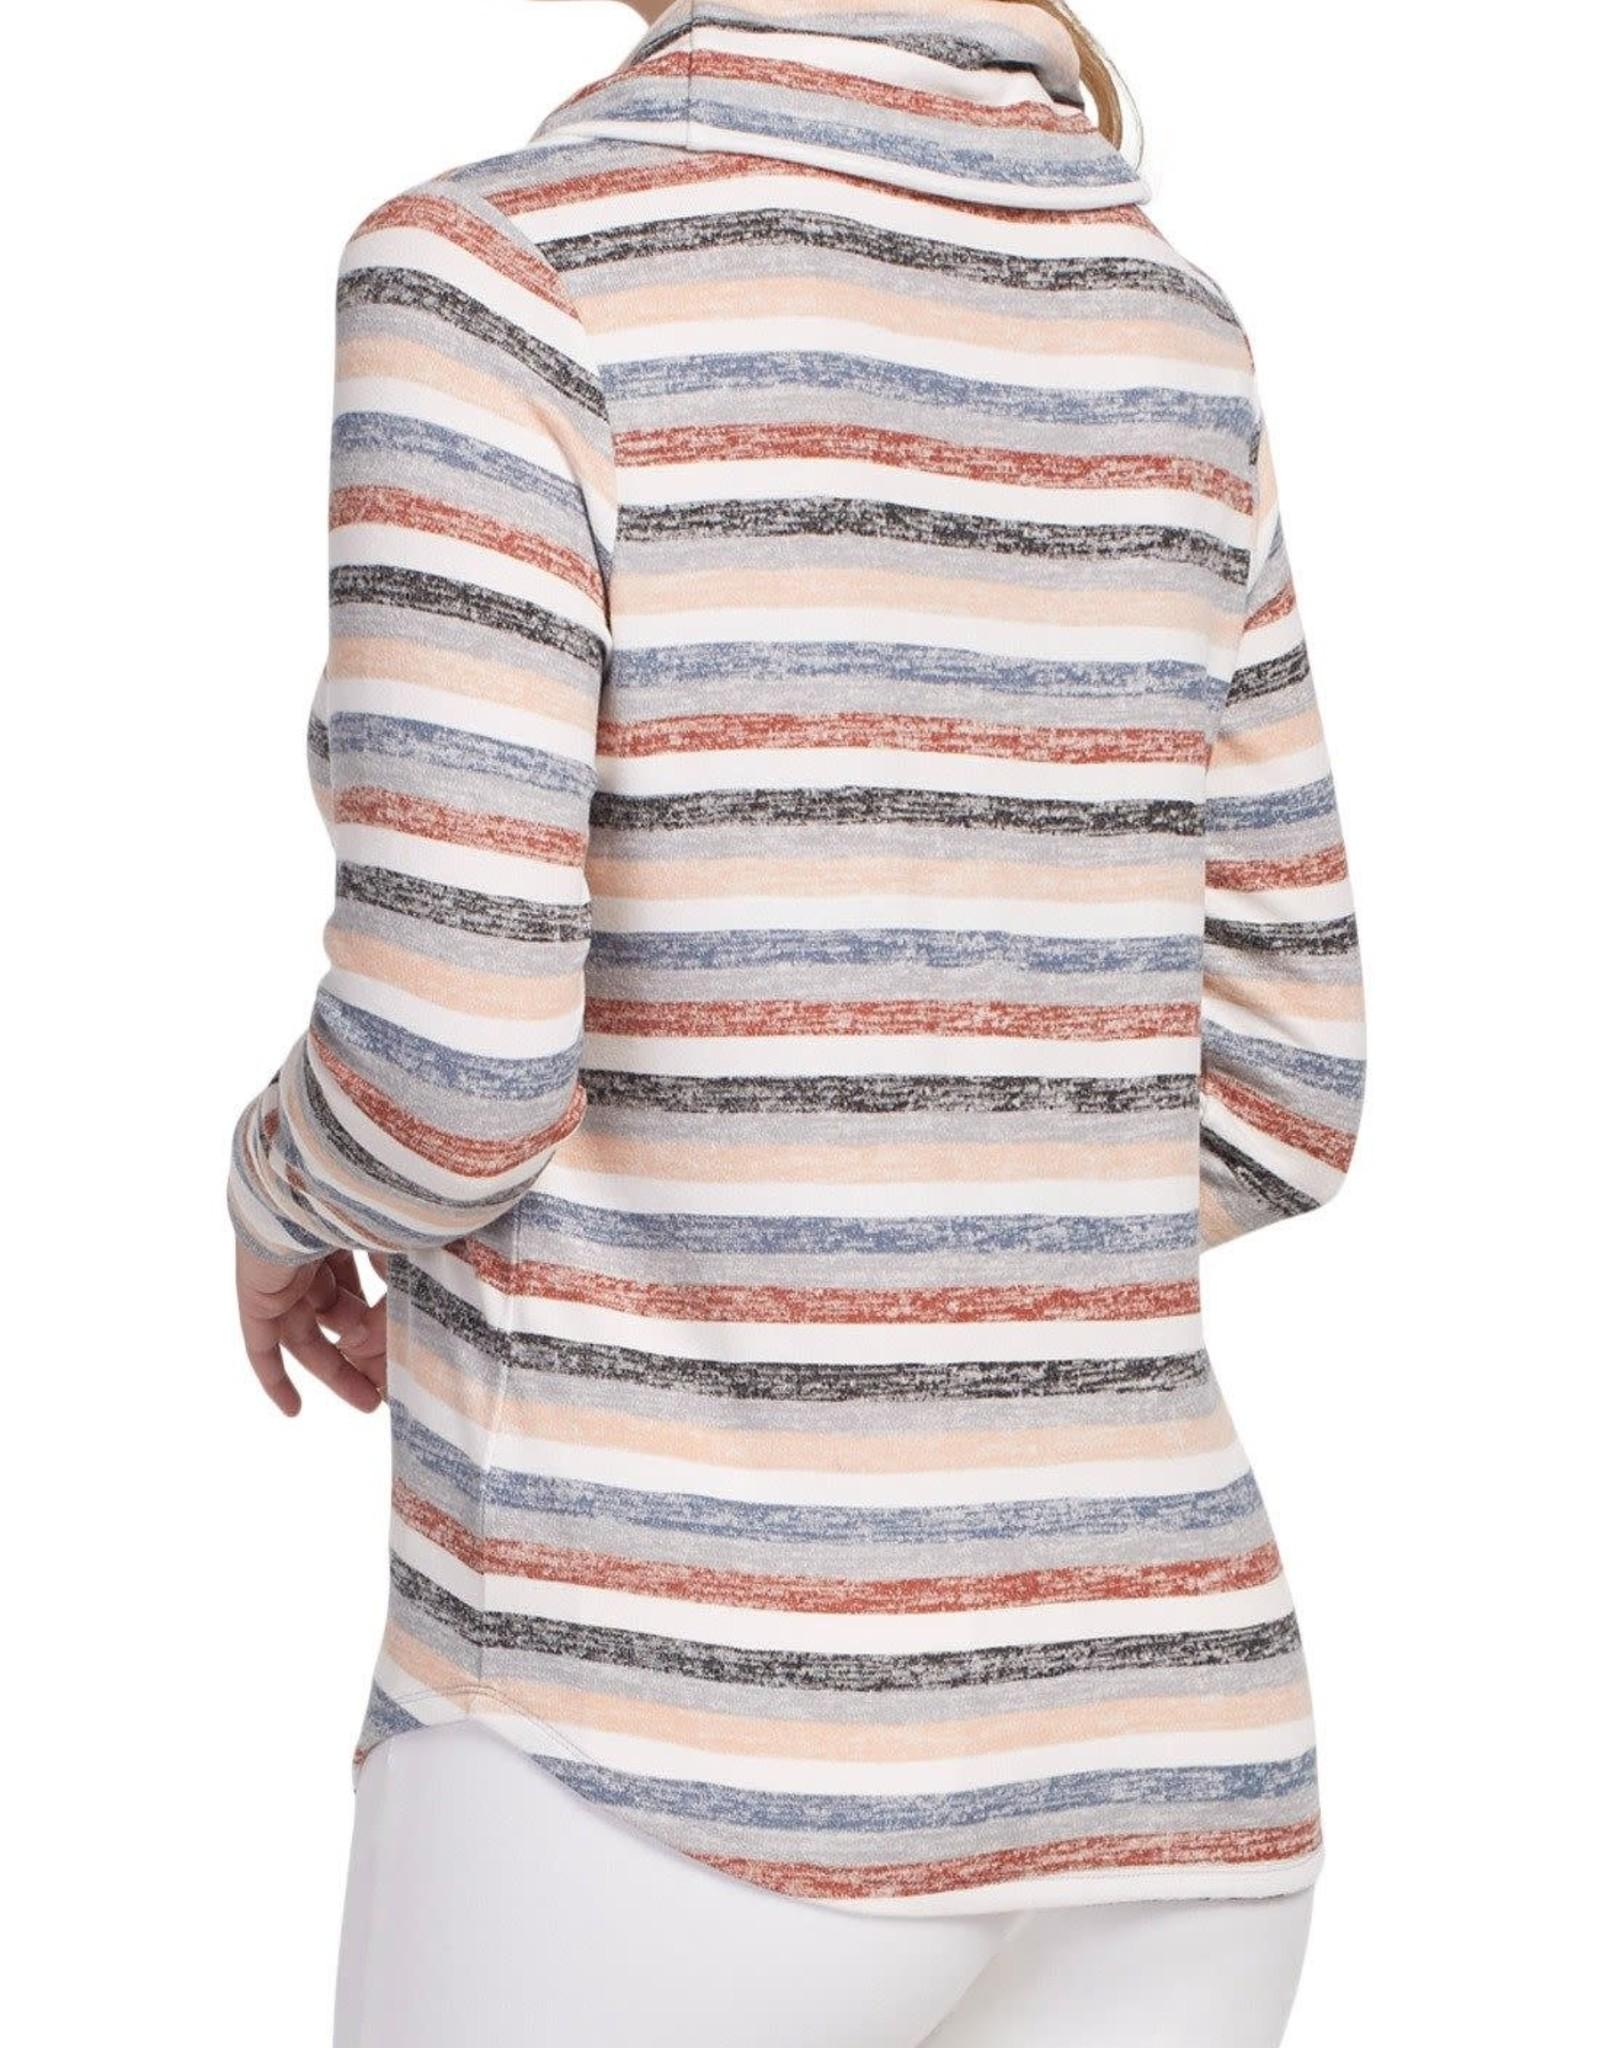 Tribal Long sleeve cowl neck top 4641O